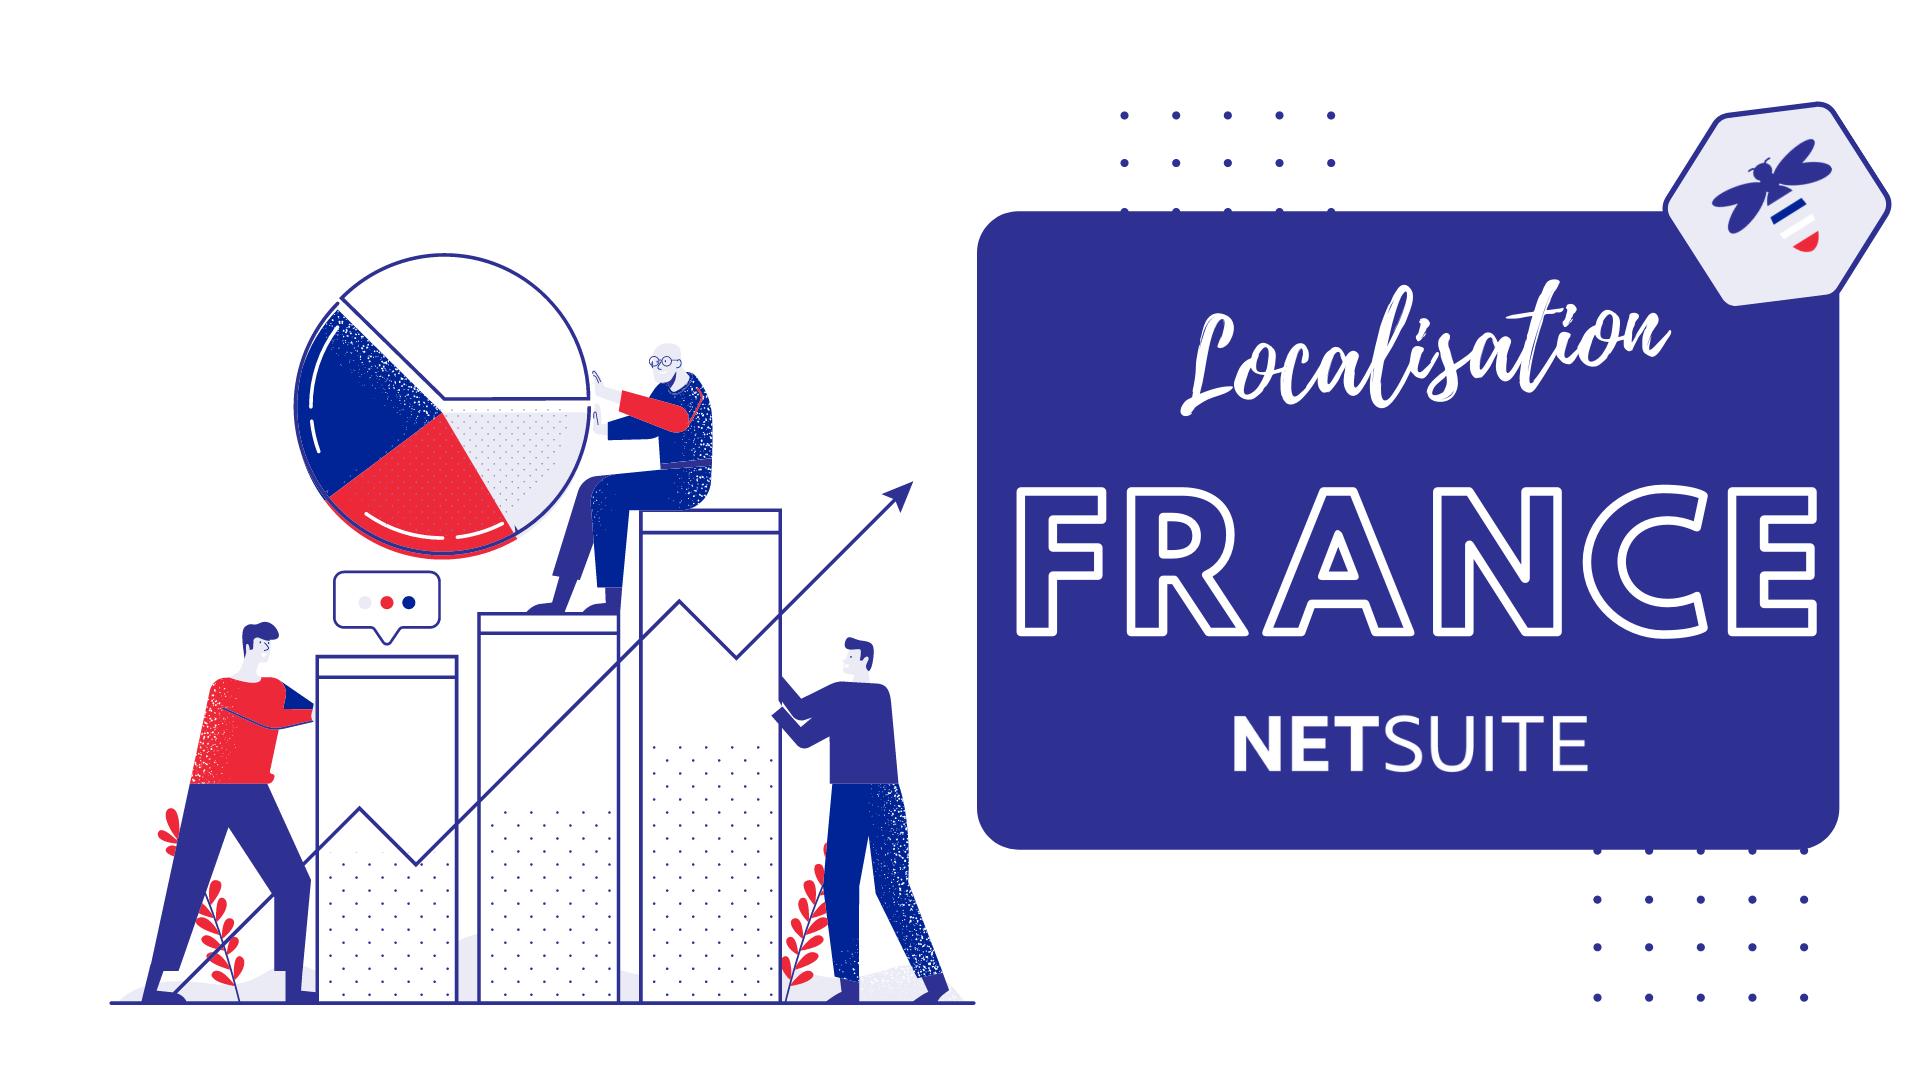 Localisation France NetSuite